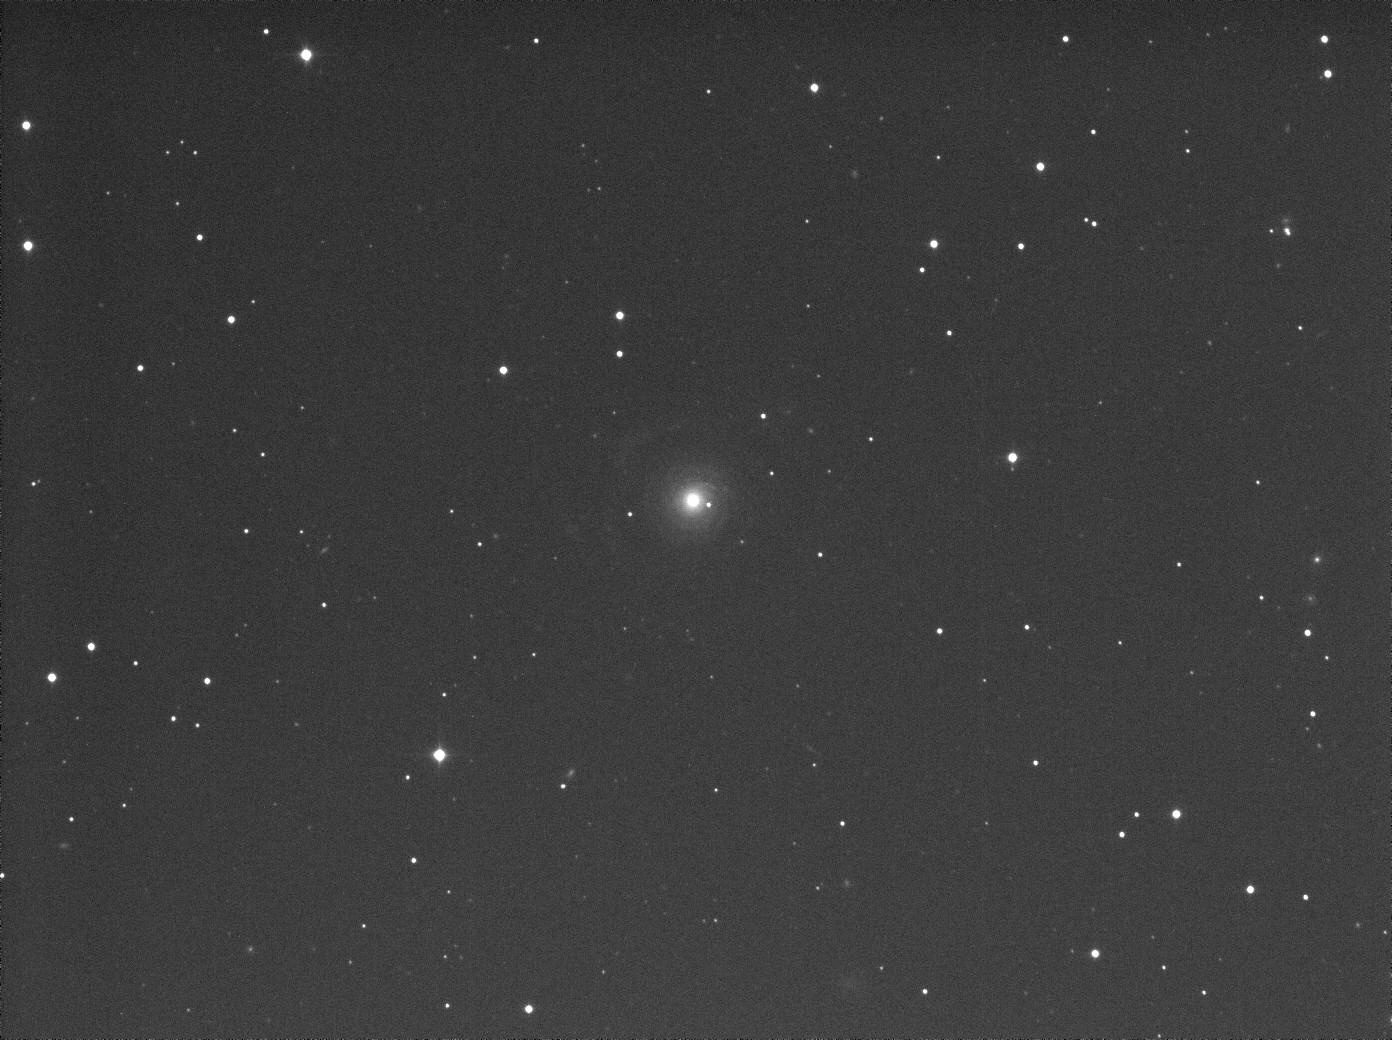 NGC3642 30x30s B1 LPS P2